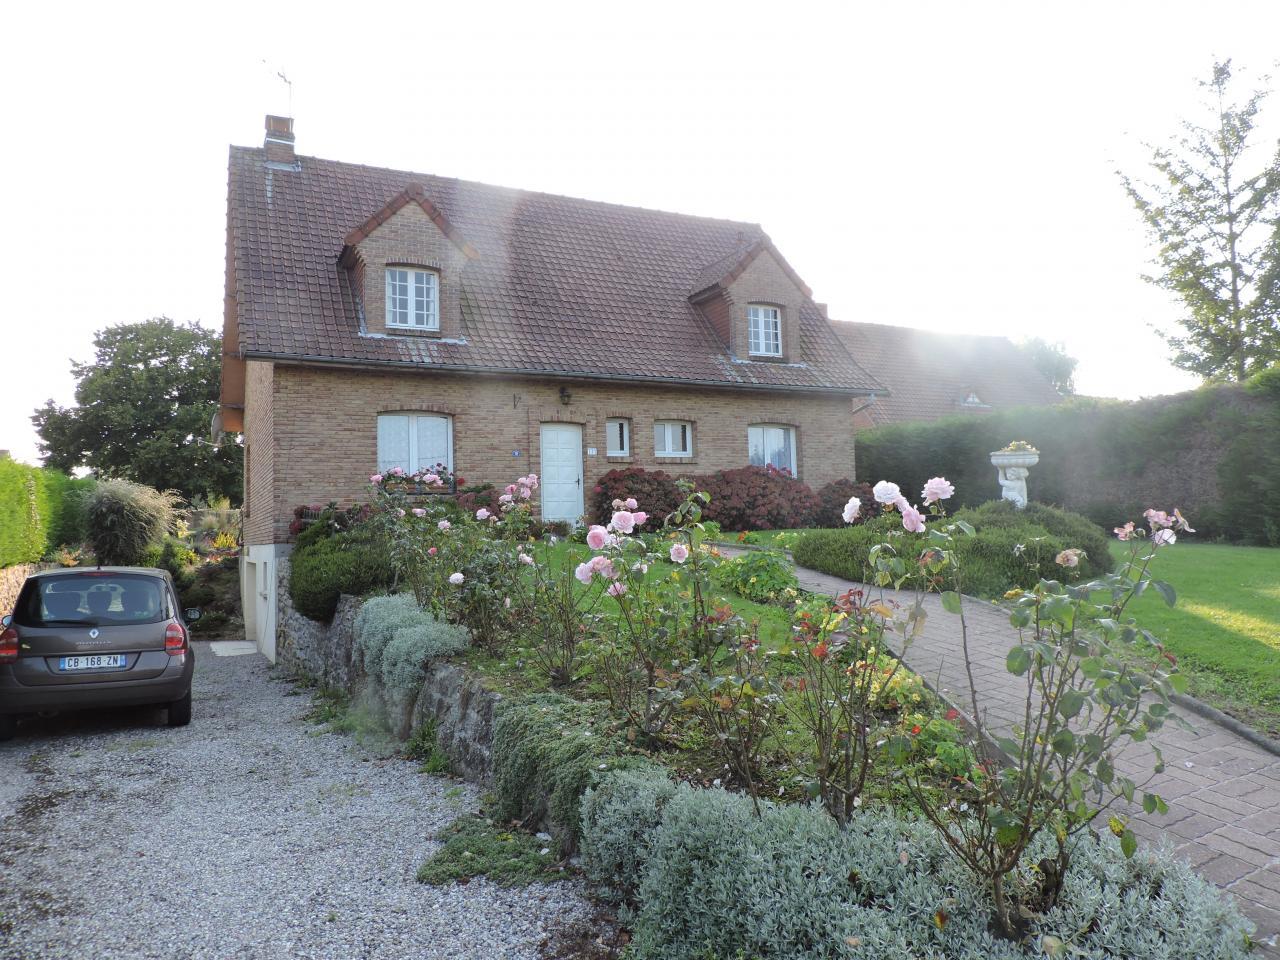 Maisons fleuries 2014 (13)